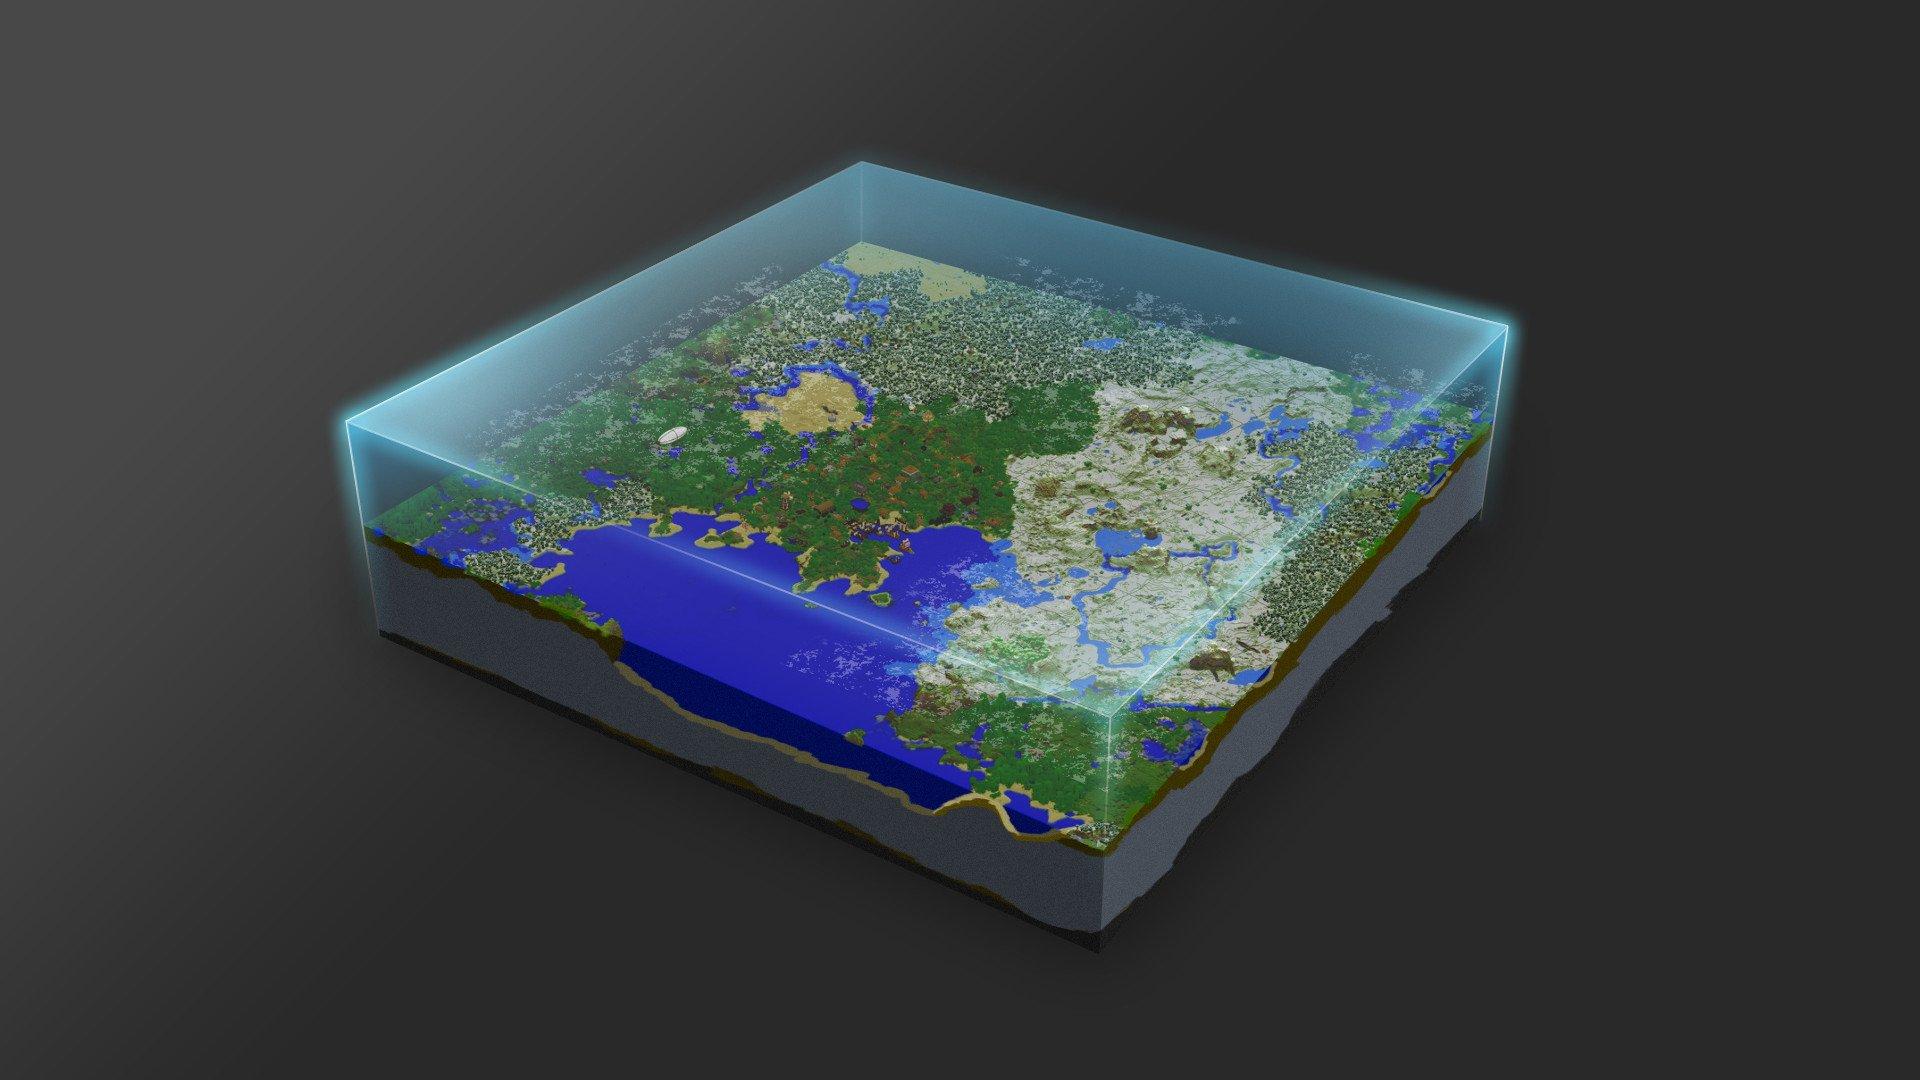 Minecraft Wallpaper 3d Herobrine Minecraft Cube Wallpaper Gaming Now